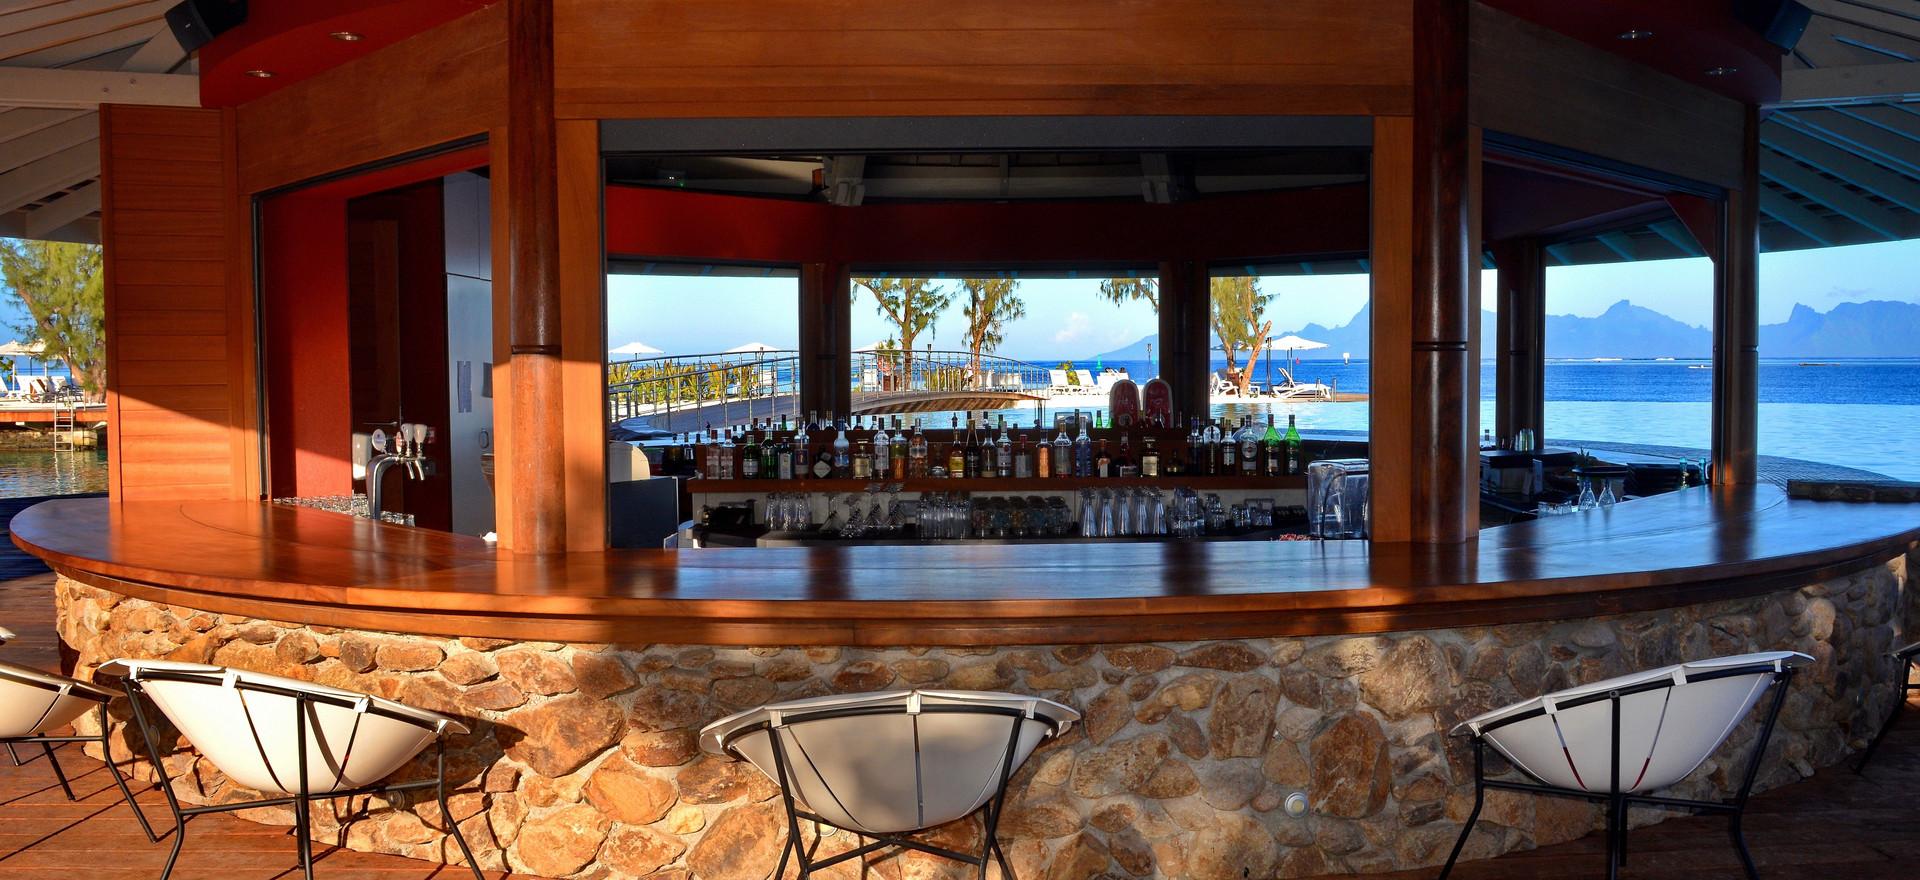 Taapuna Bar & Restaurant